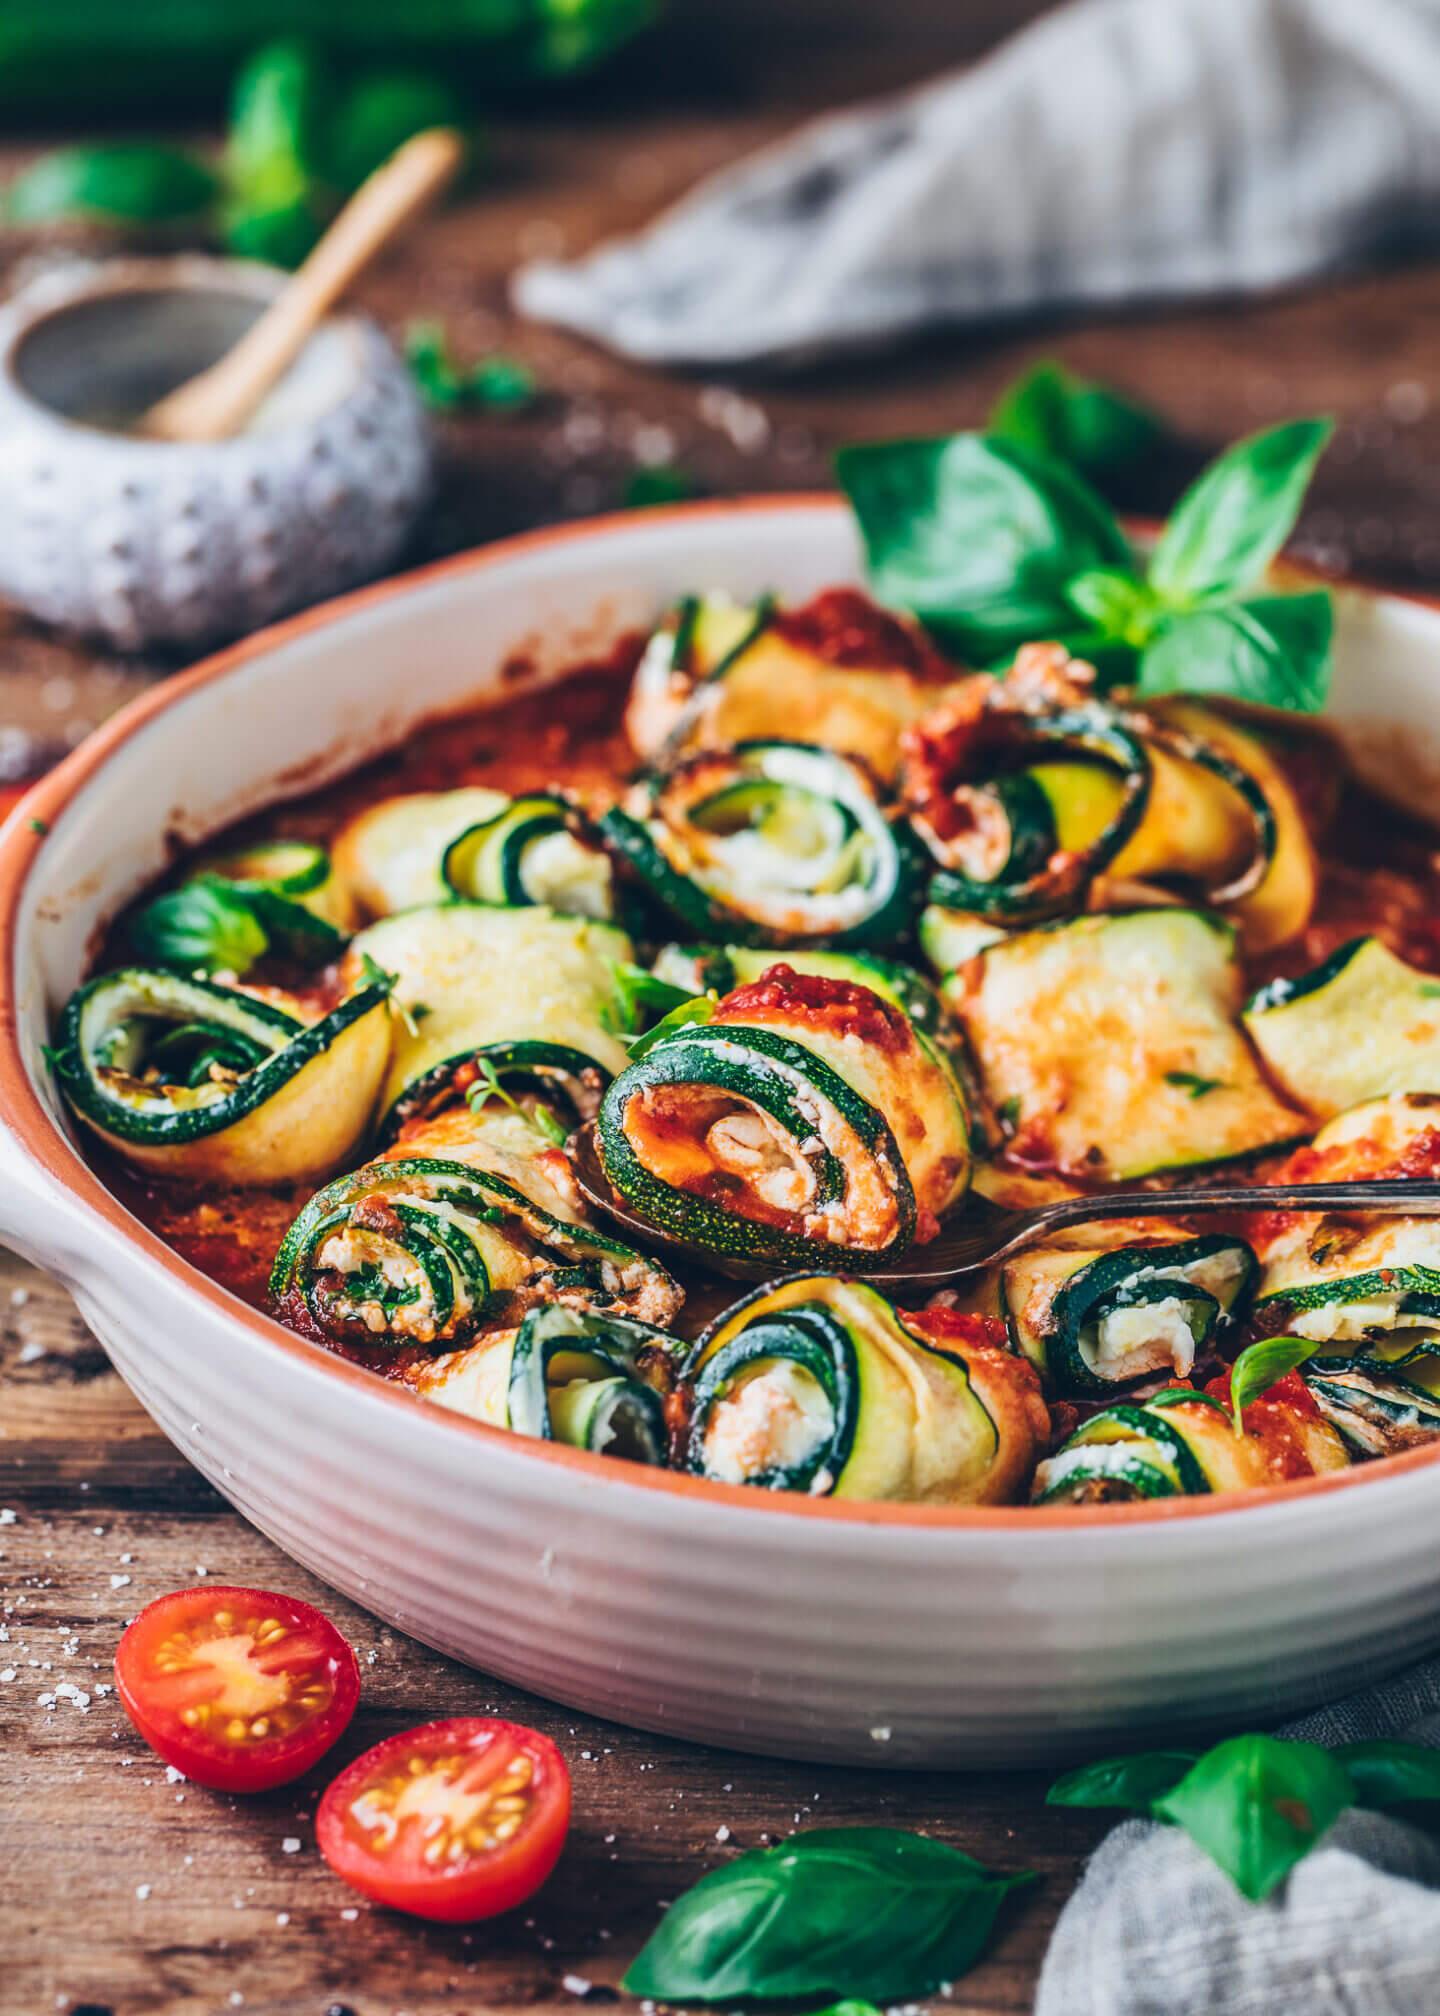 Zucchini Lasagne Röllchen (Involtini, Auflauf mit Tomatensauce)